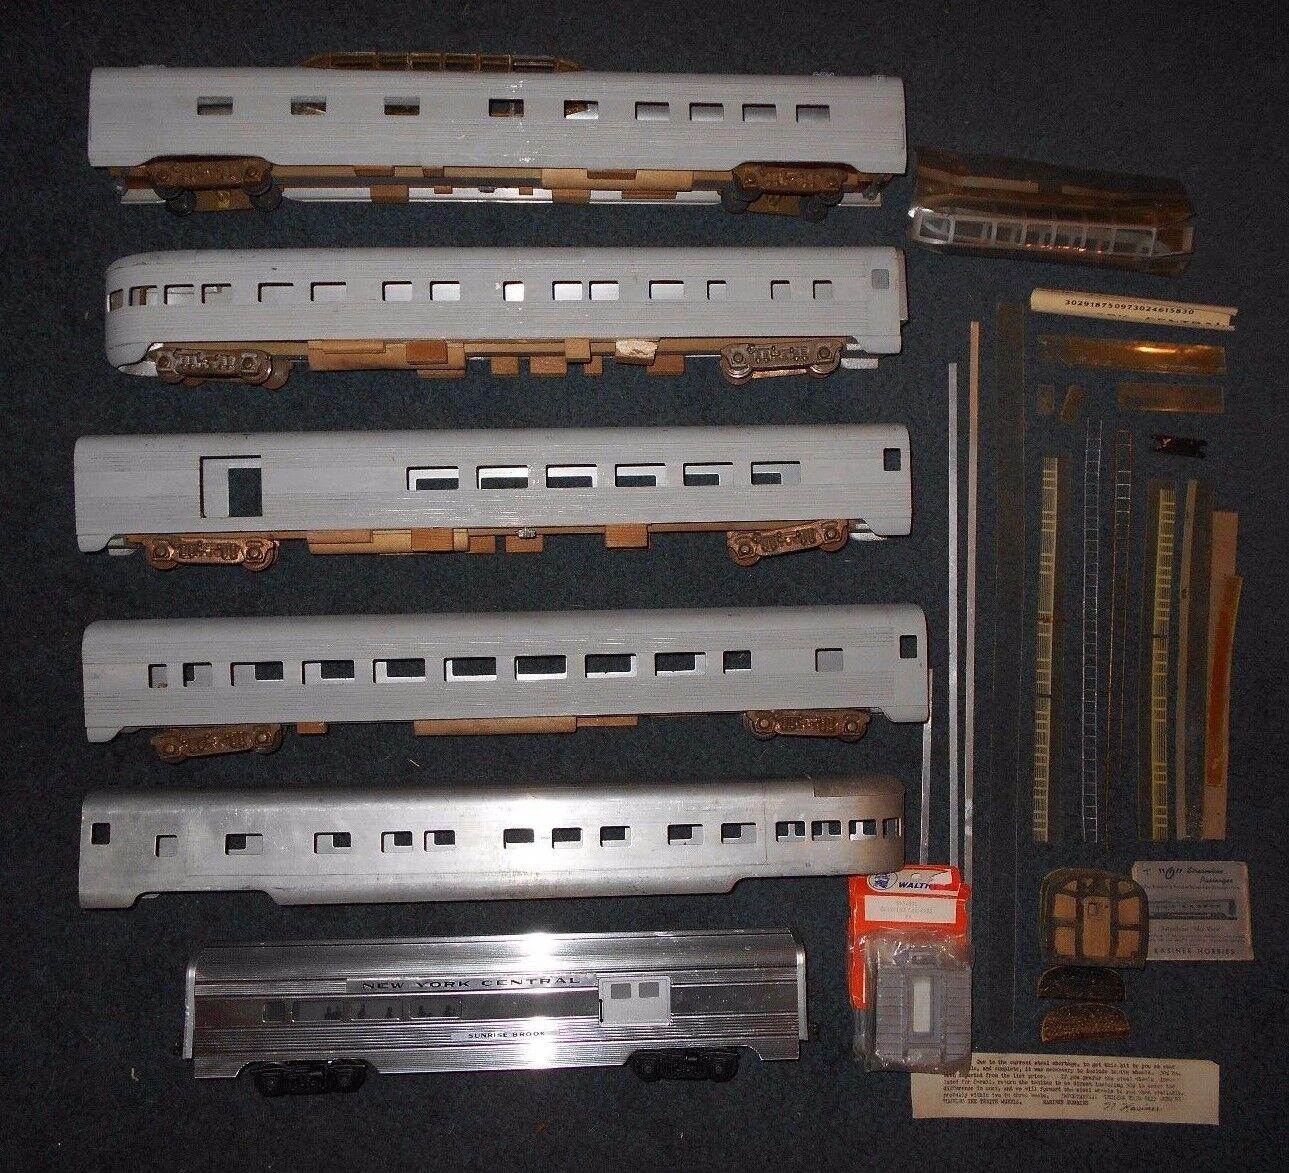 6 Lionel O ga nuovo York Centrale e Kasiner 21 pollici Auto Passeggeri Kit Aluminum autos